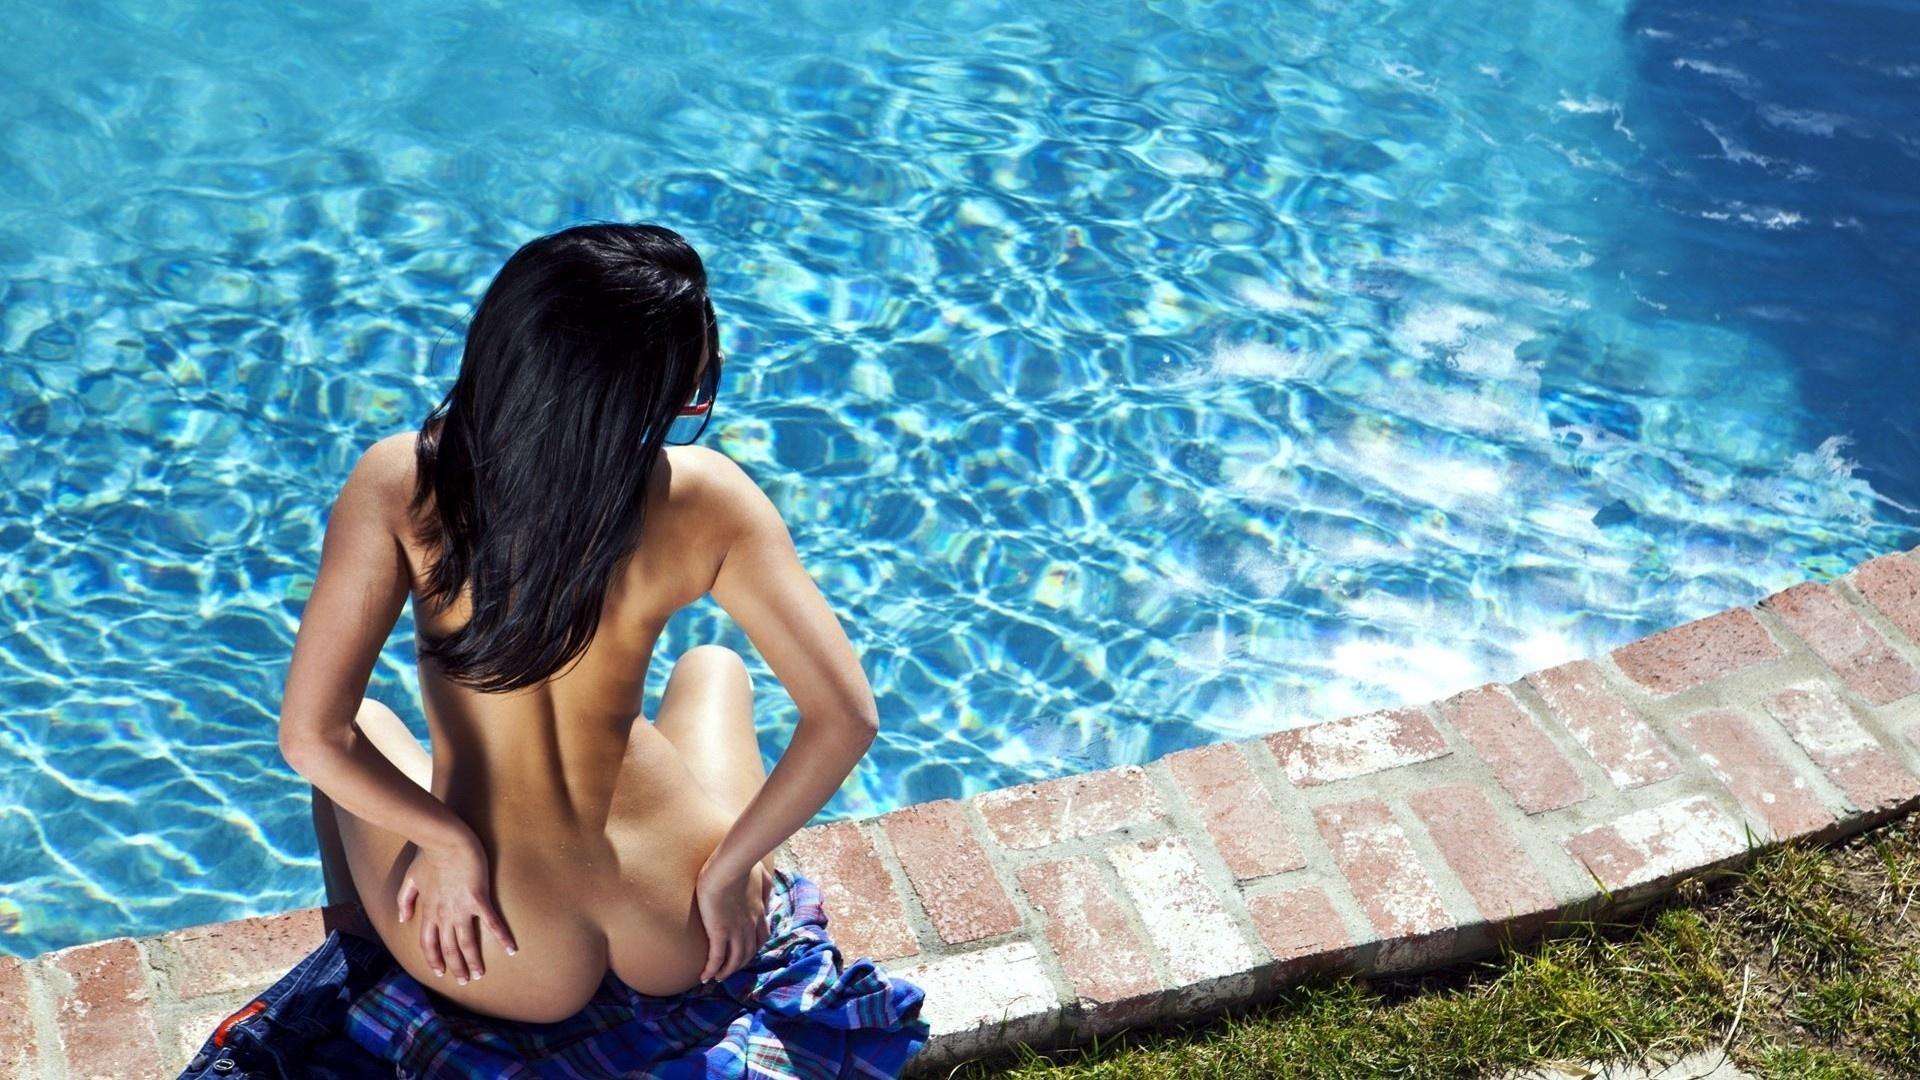 Leyla Black Nude In Pool Boy